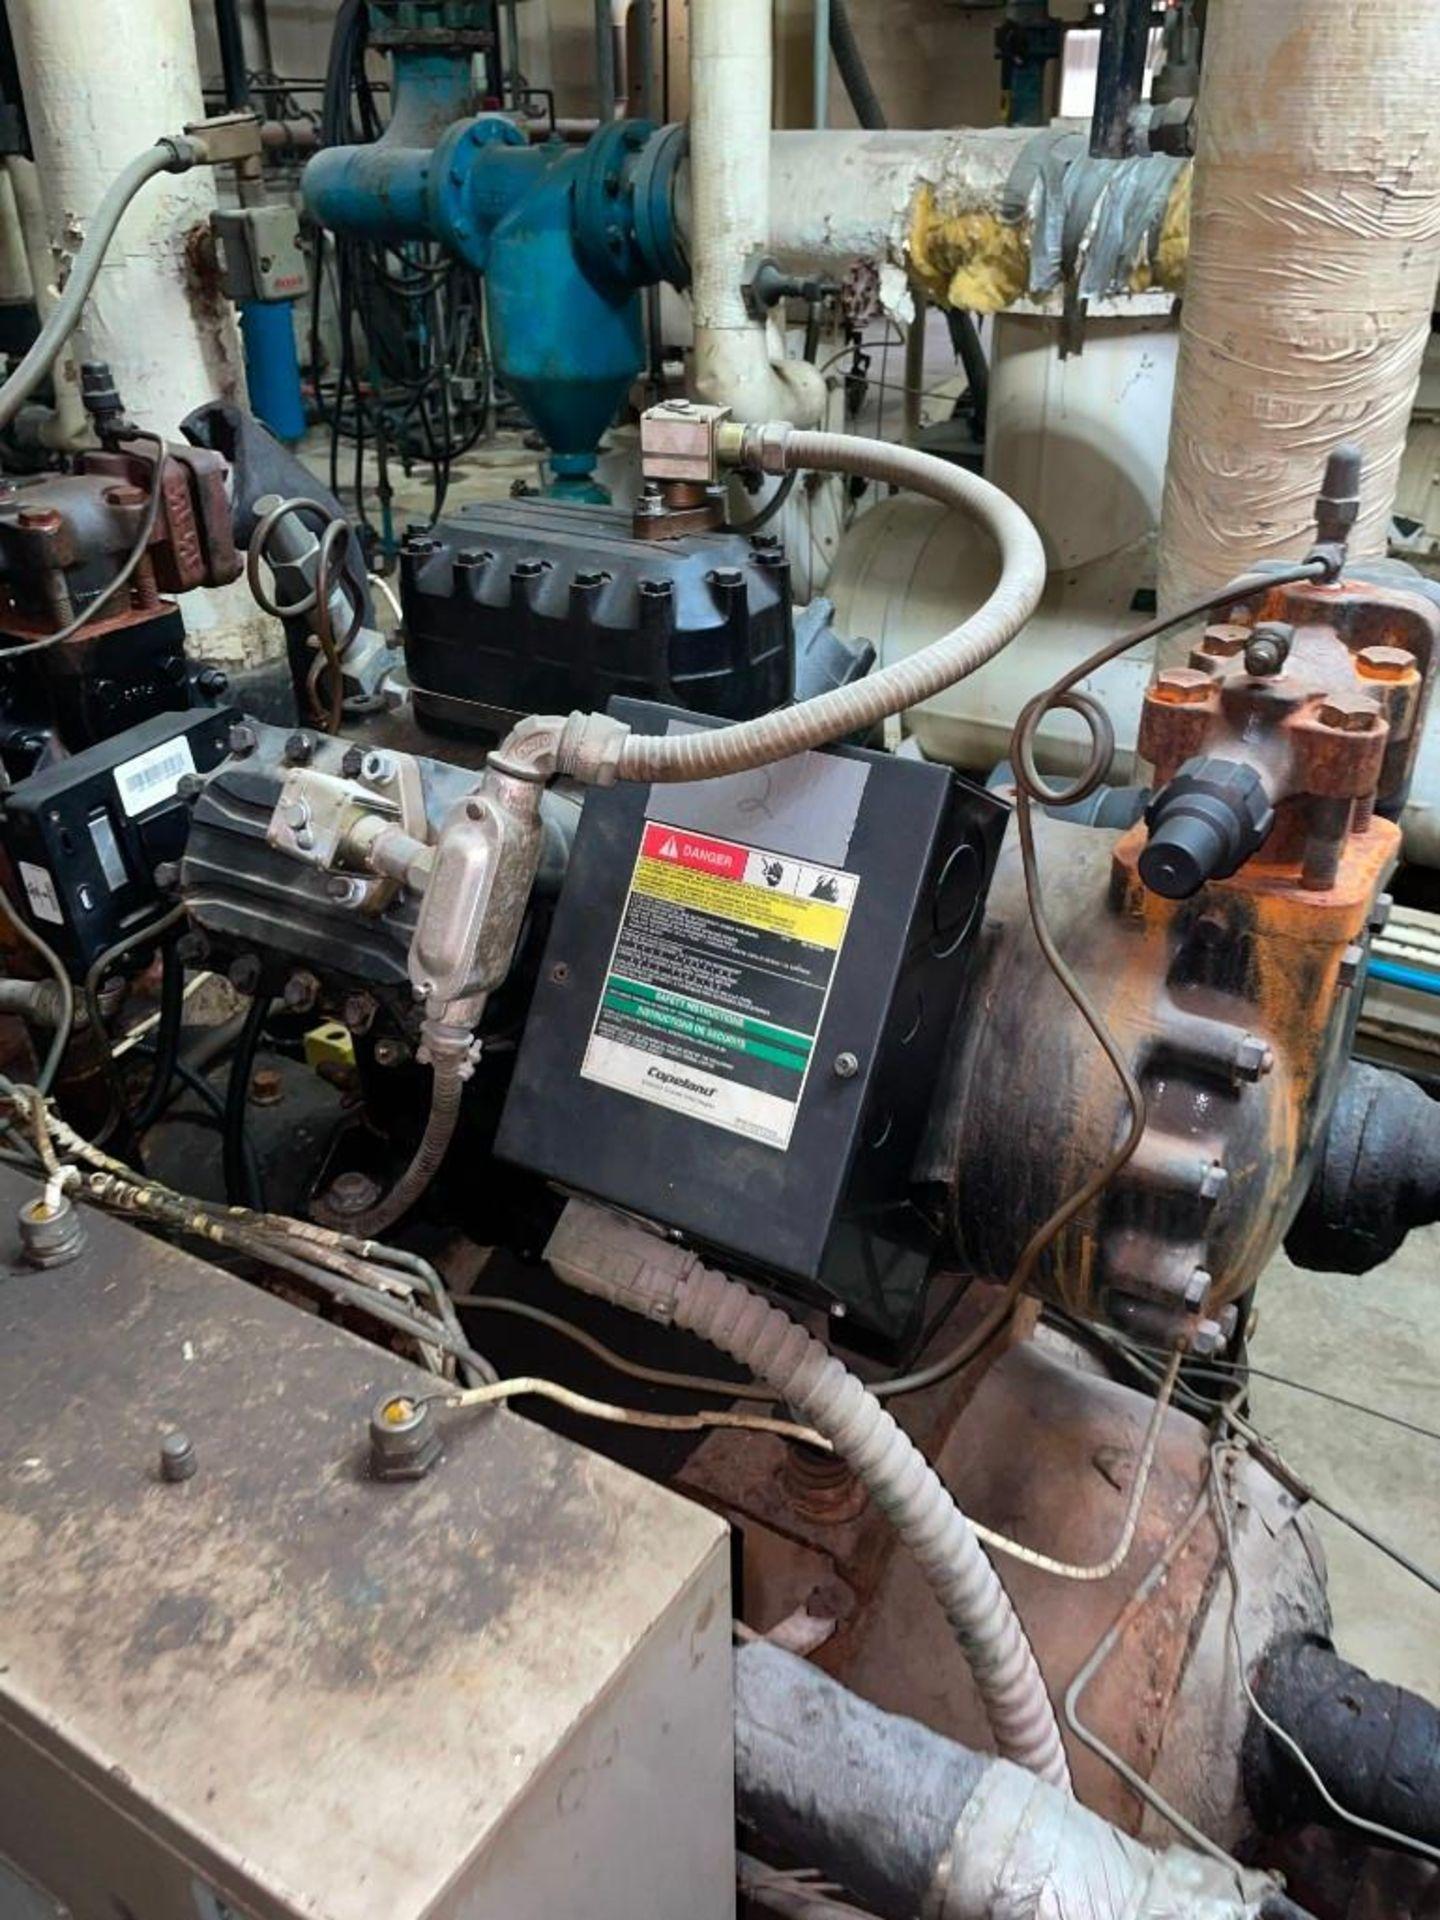 Copeland Copelametic Compressor for Chiller System - Image 10 of 12